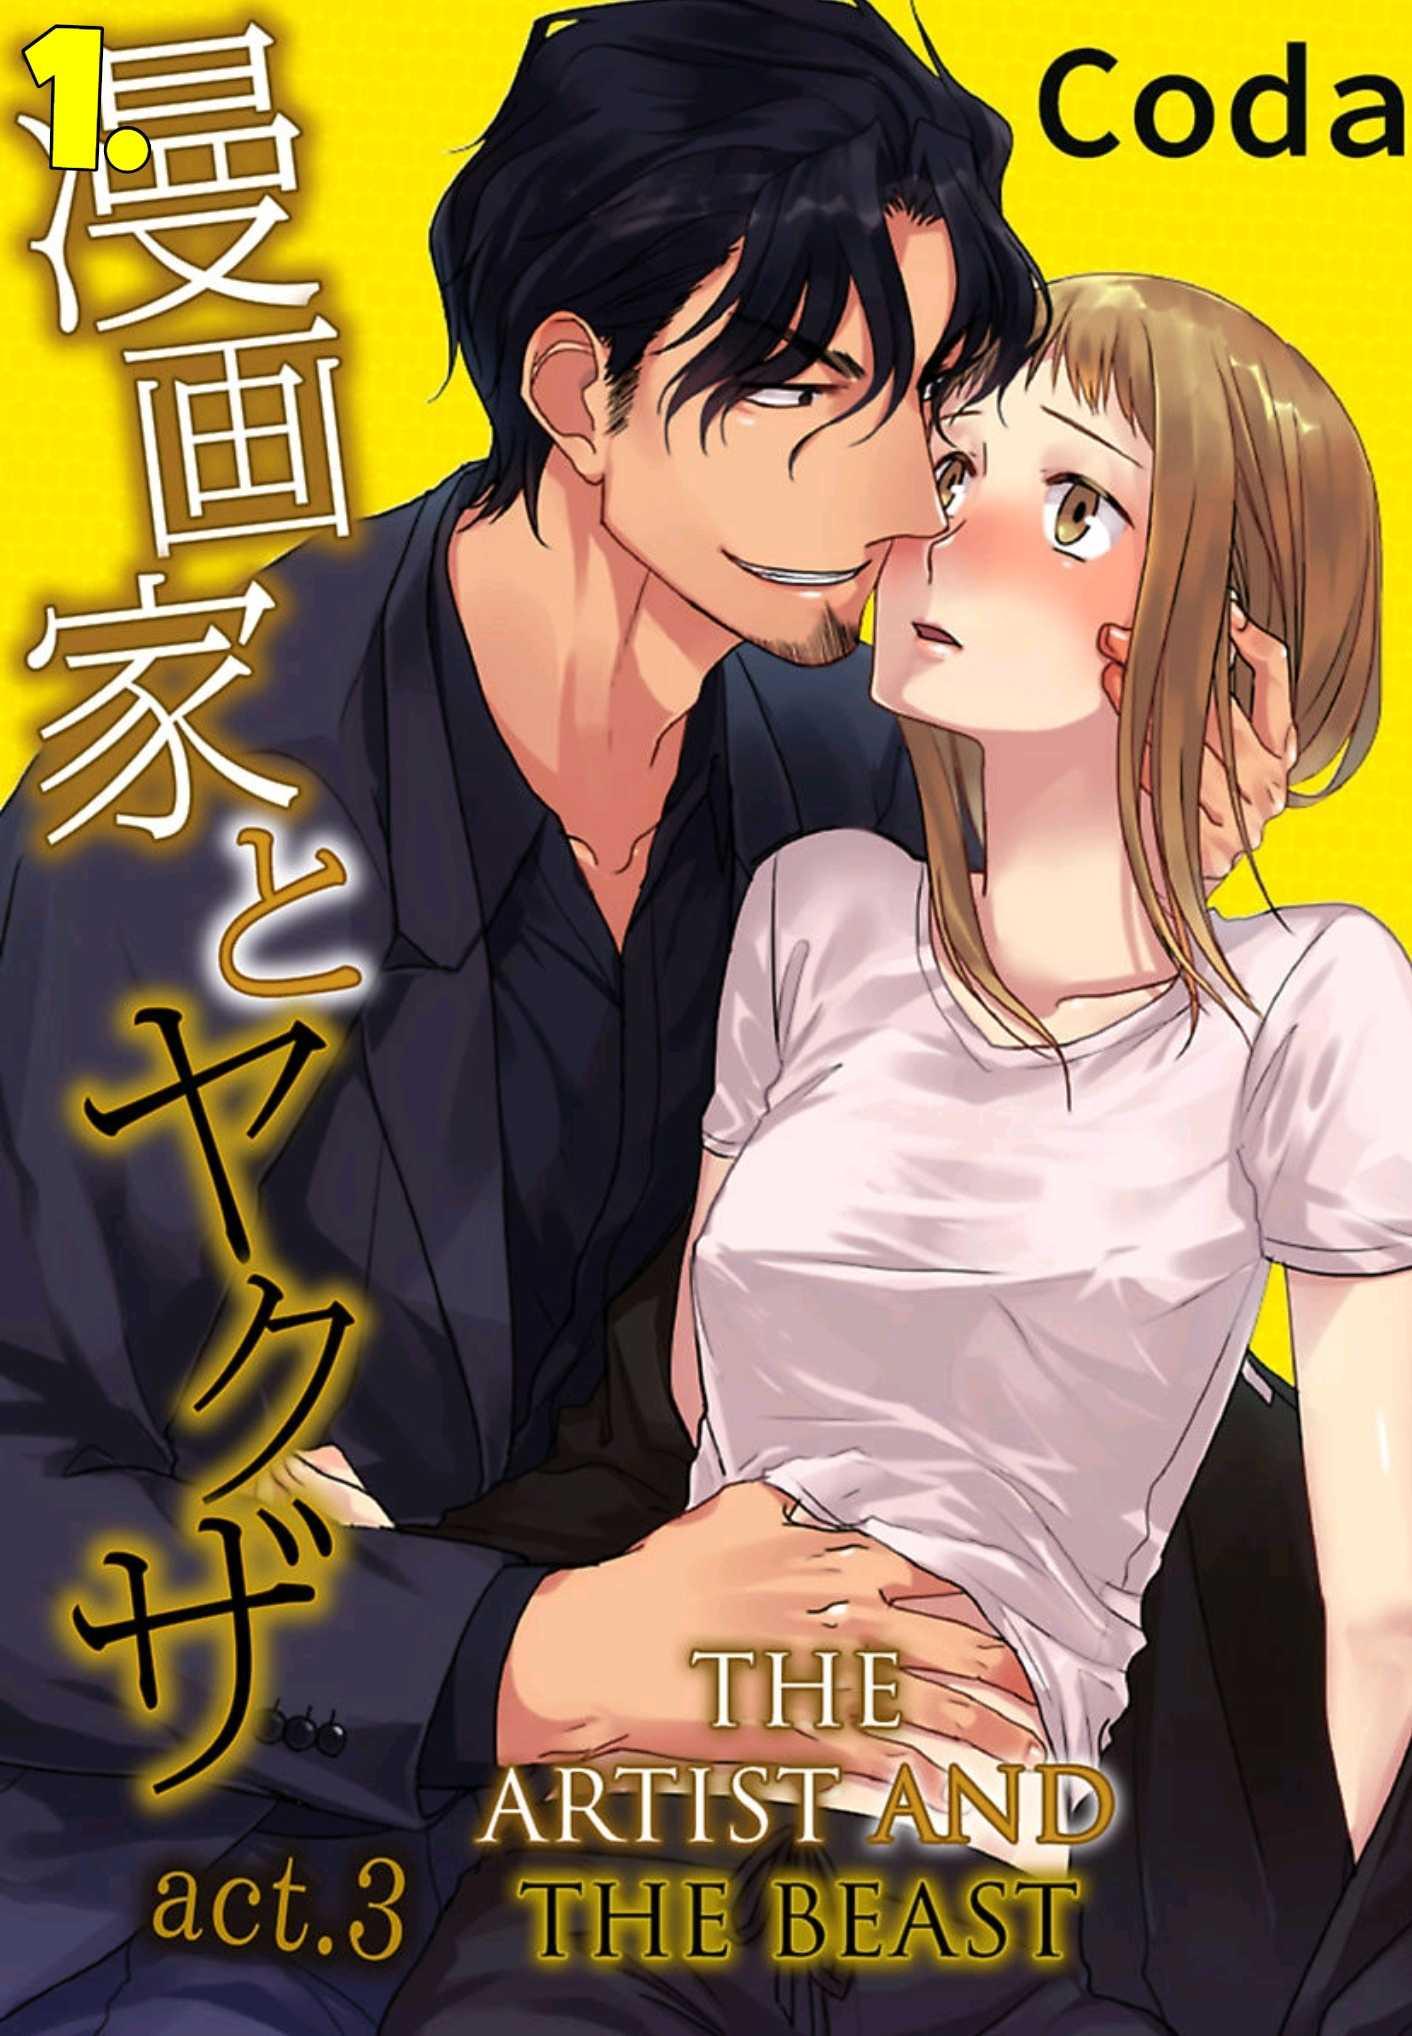 Mangaka to Yakuza (The Artist and the Beast)